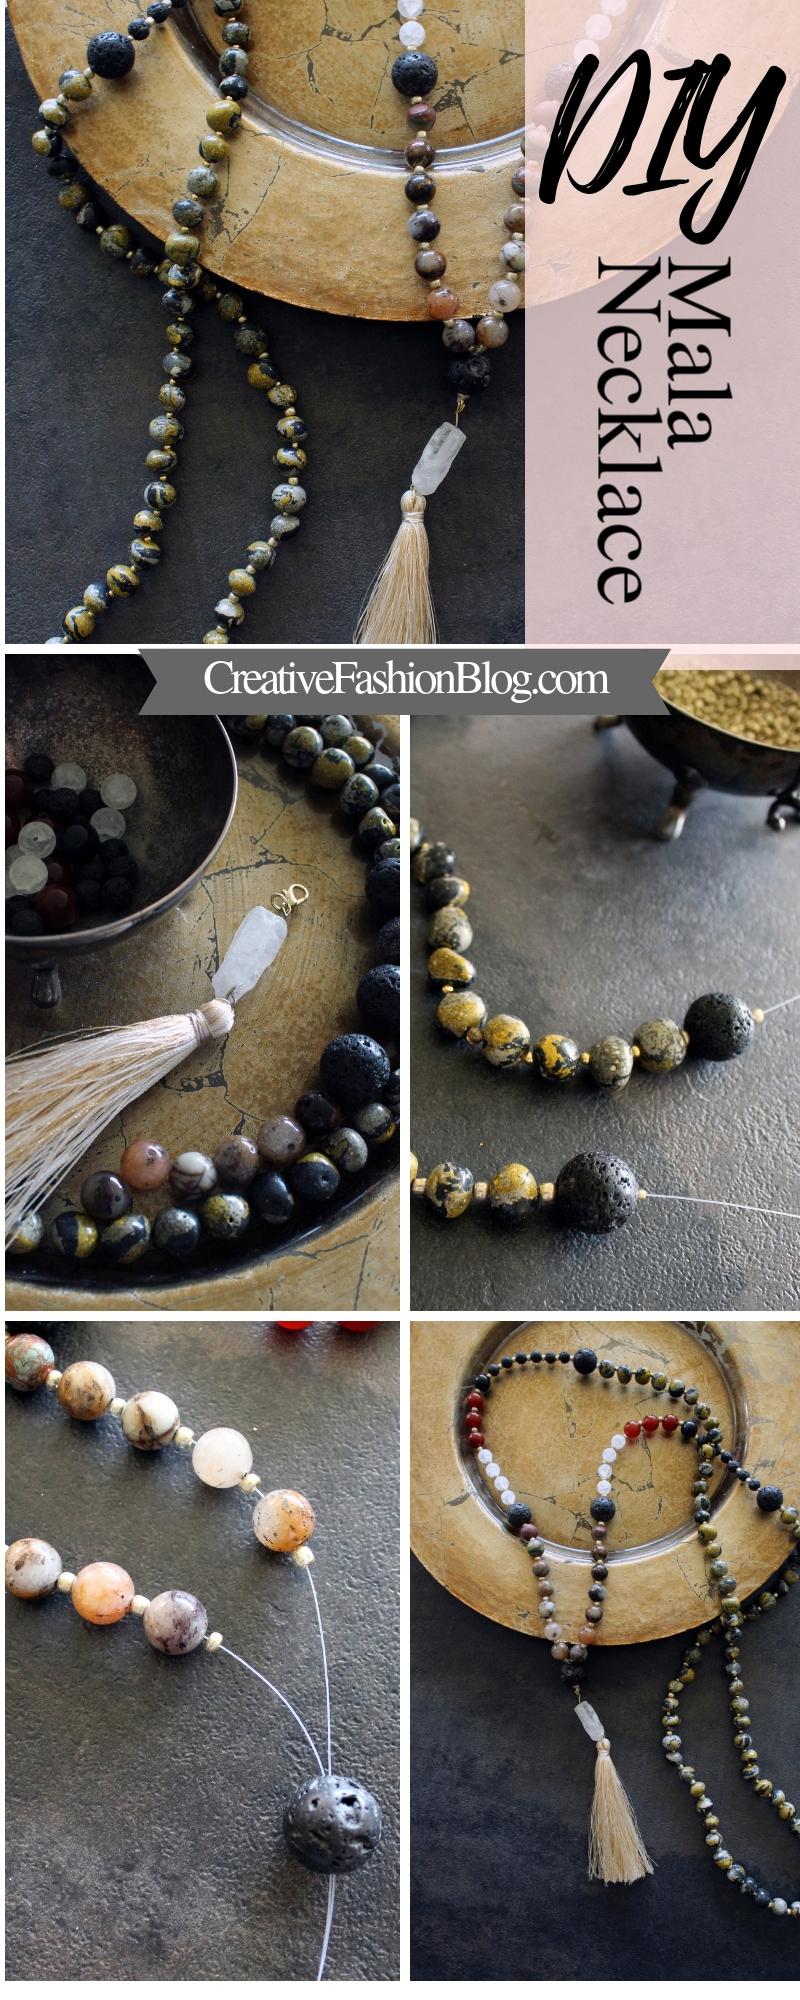 Make Your Own DIY Crystal Mala Beads for Meditation and Goal Setting..